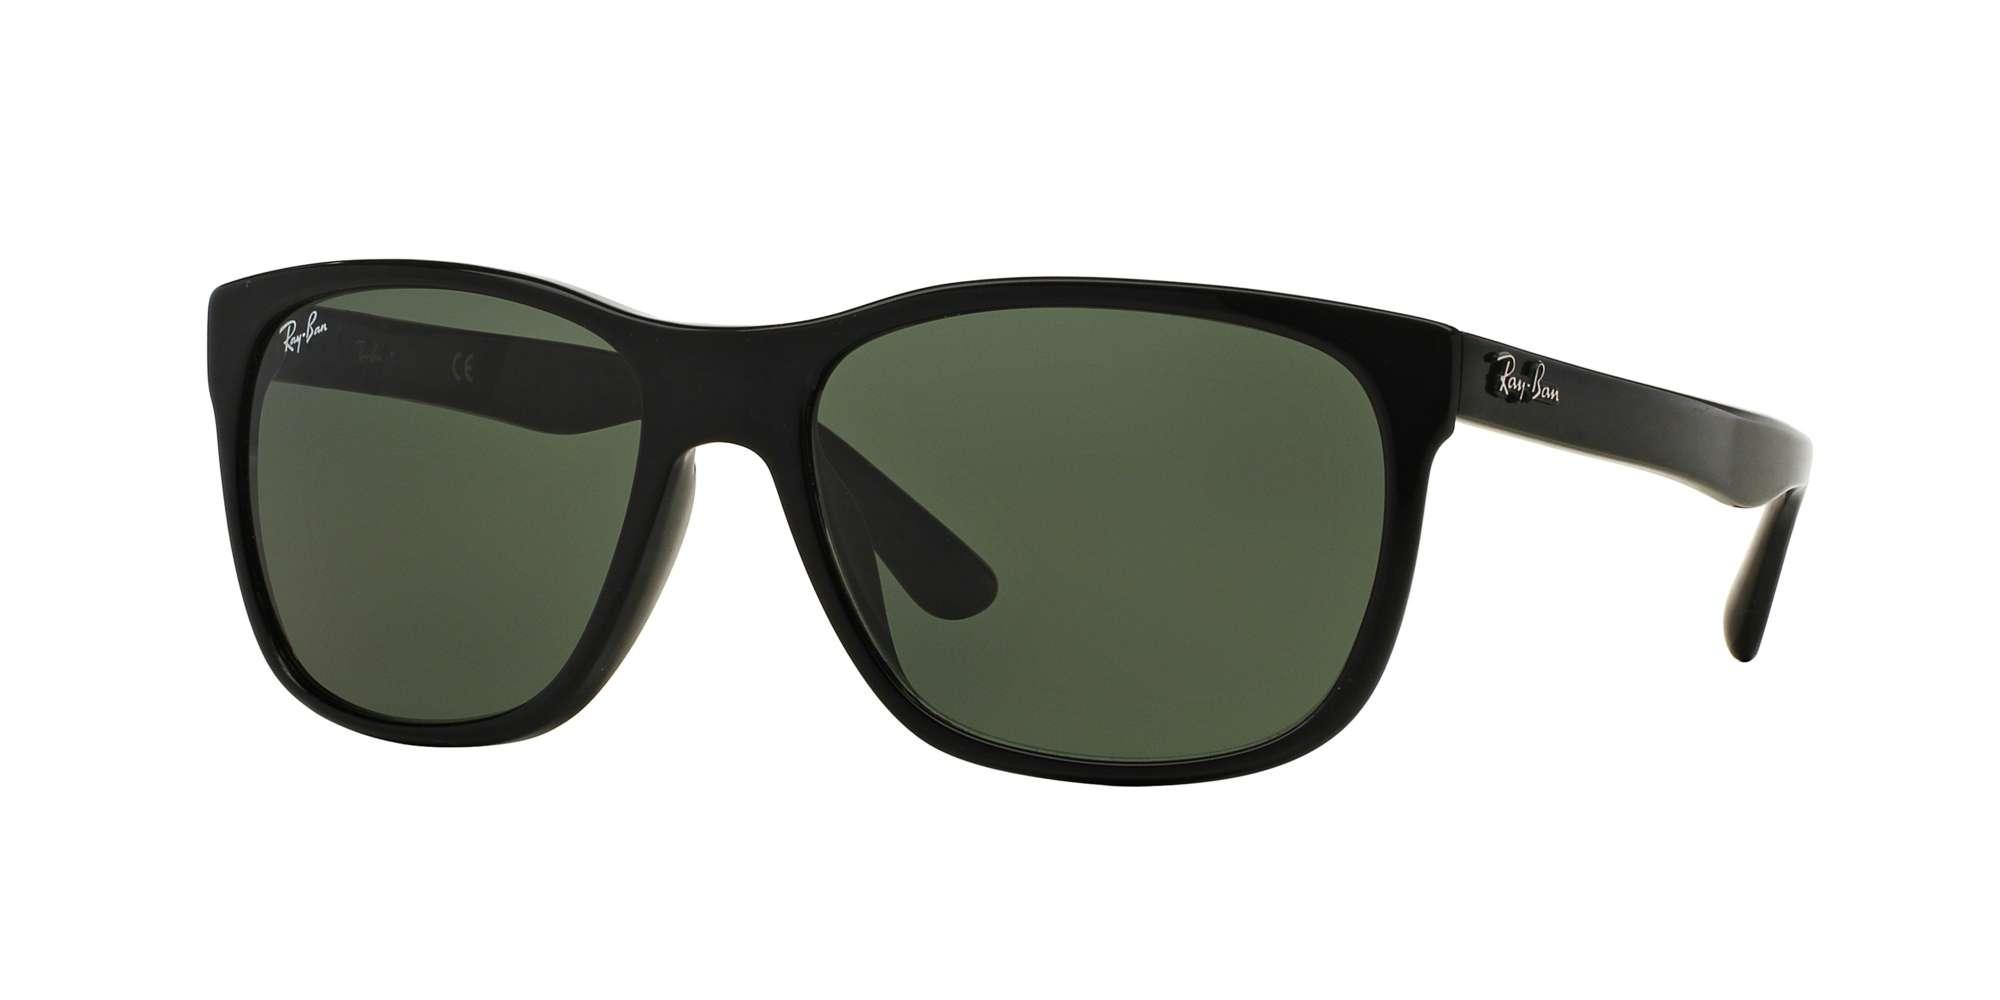 BLACK / CRYSTAL GREEN lenses